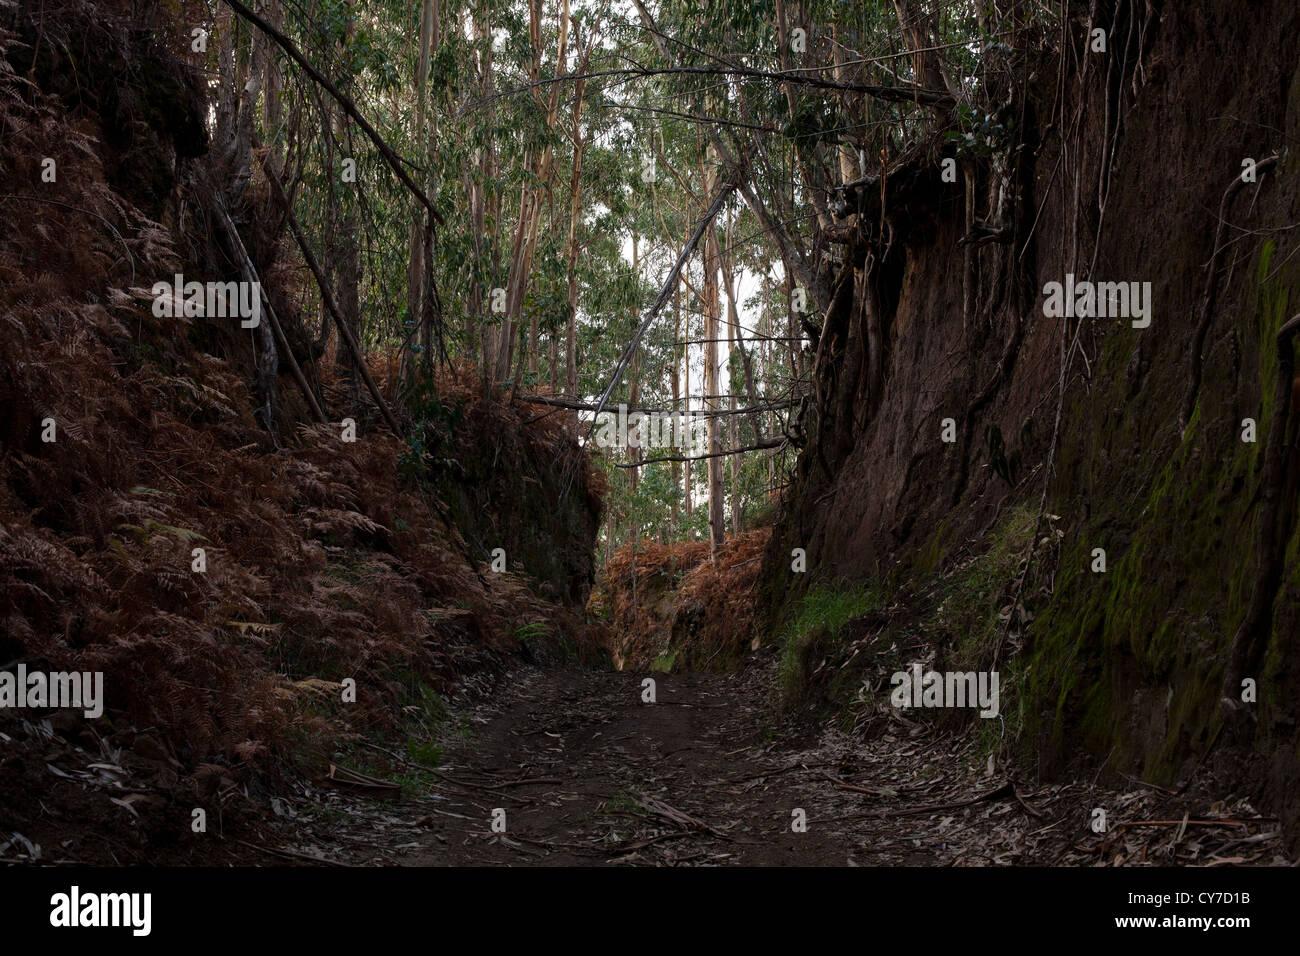 A deep cut dirt track through a eucalyptus plantation on the western side of Madeira island. - Stock Image